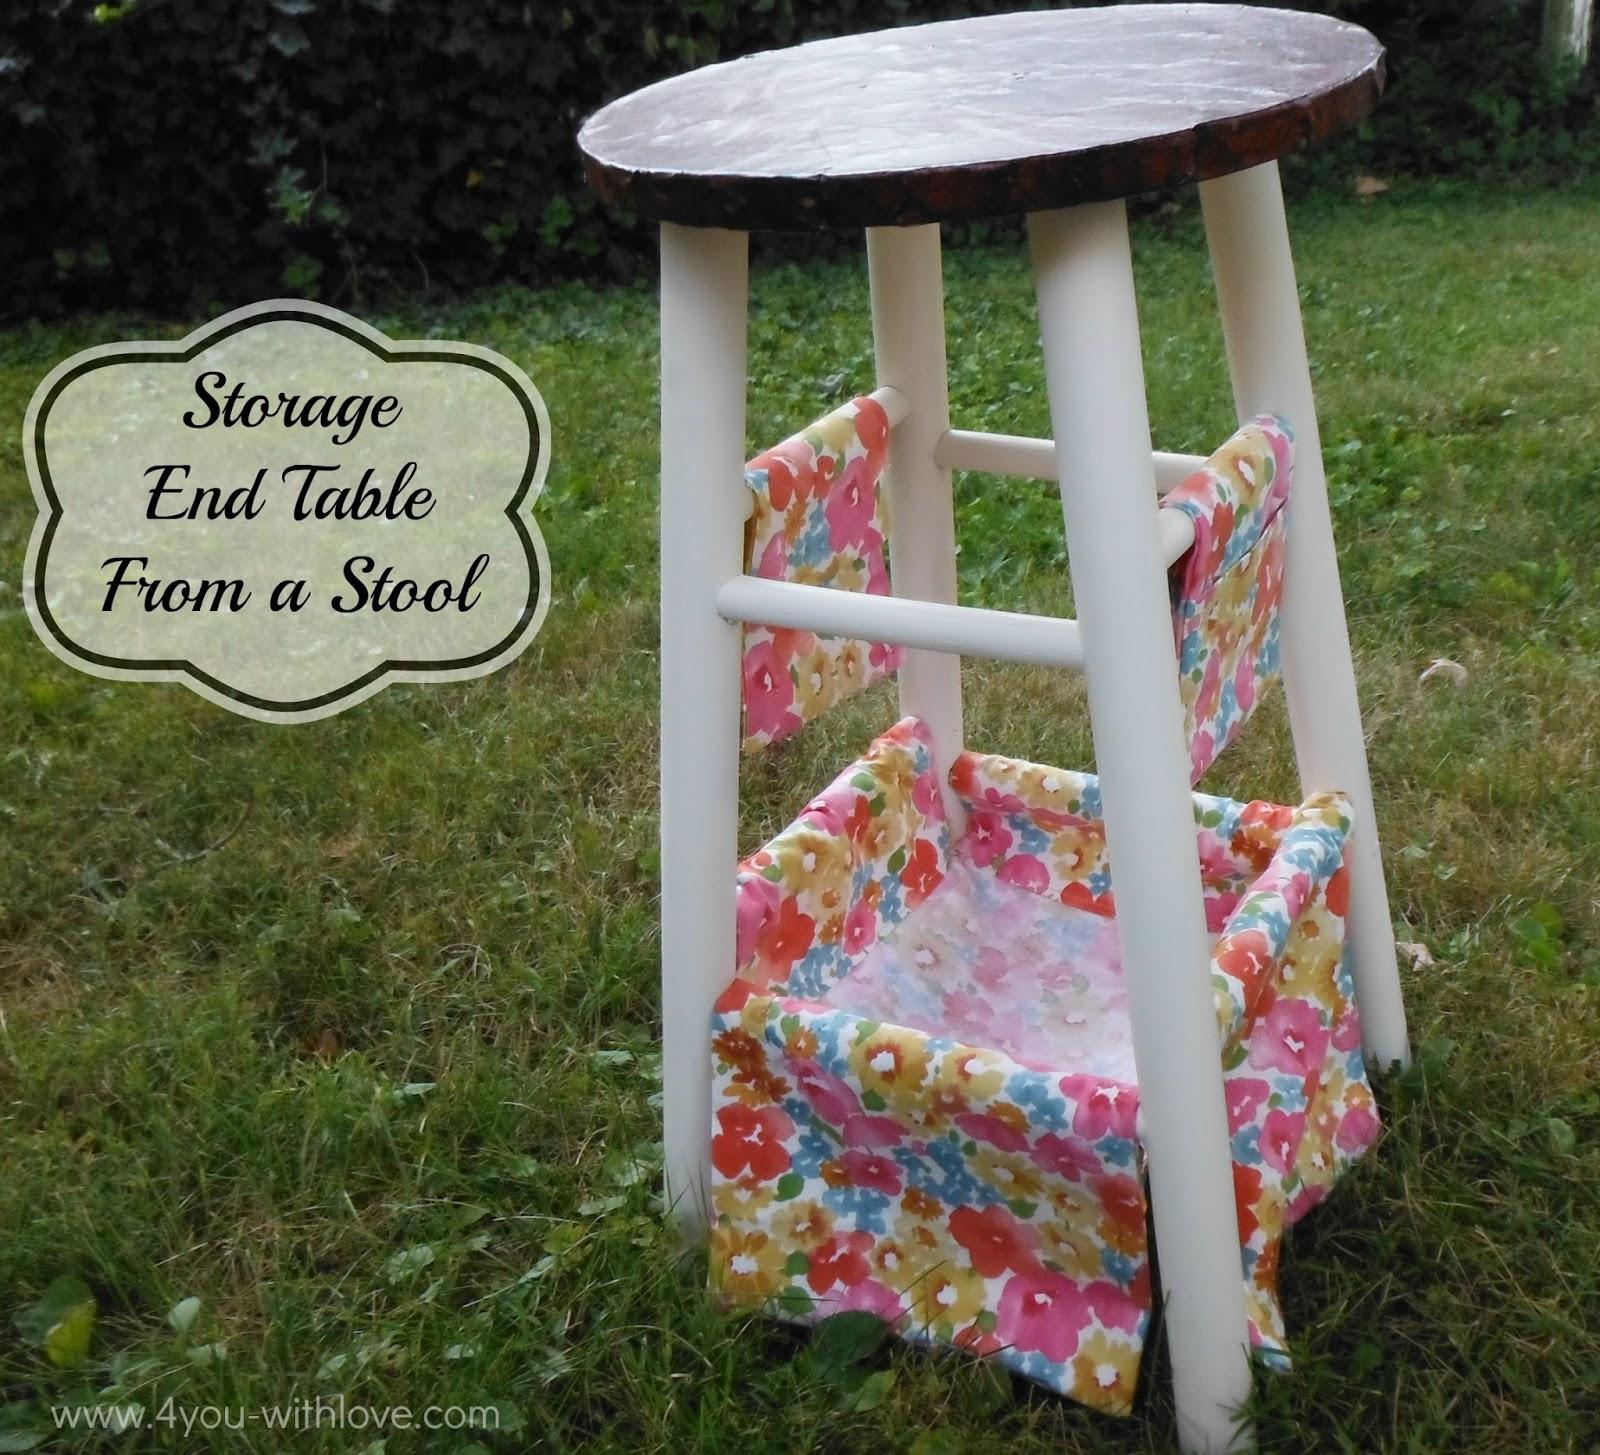 #WaverizeIt Challenge Project u2013 Stool End Table w/Storage! & WaverizeIt Challenge Project - Stool End Table w/Storage! - 4 You ... islam-shia.org